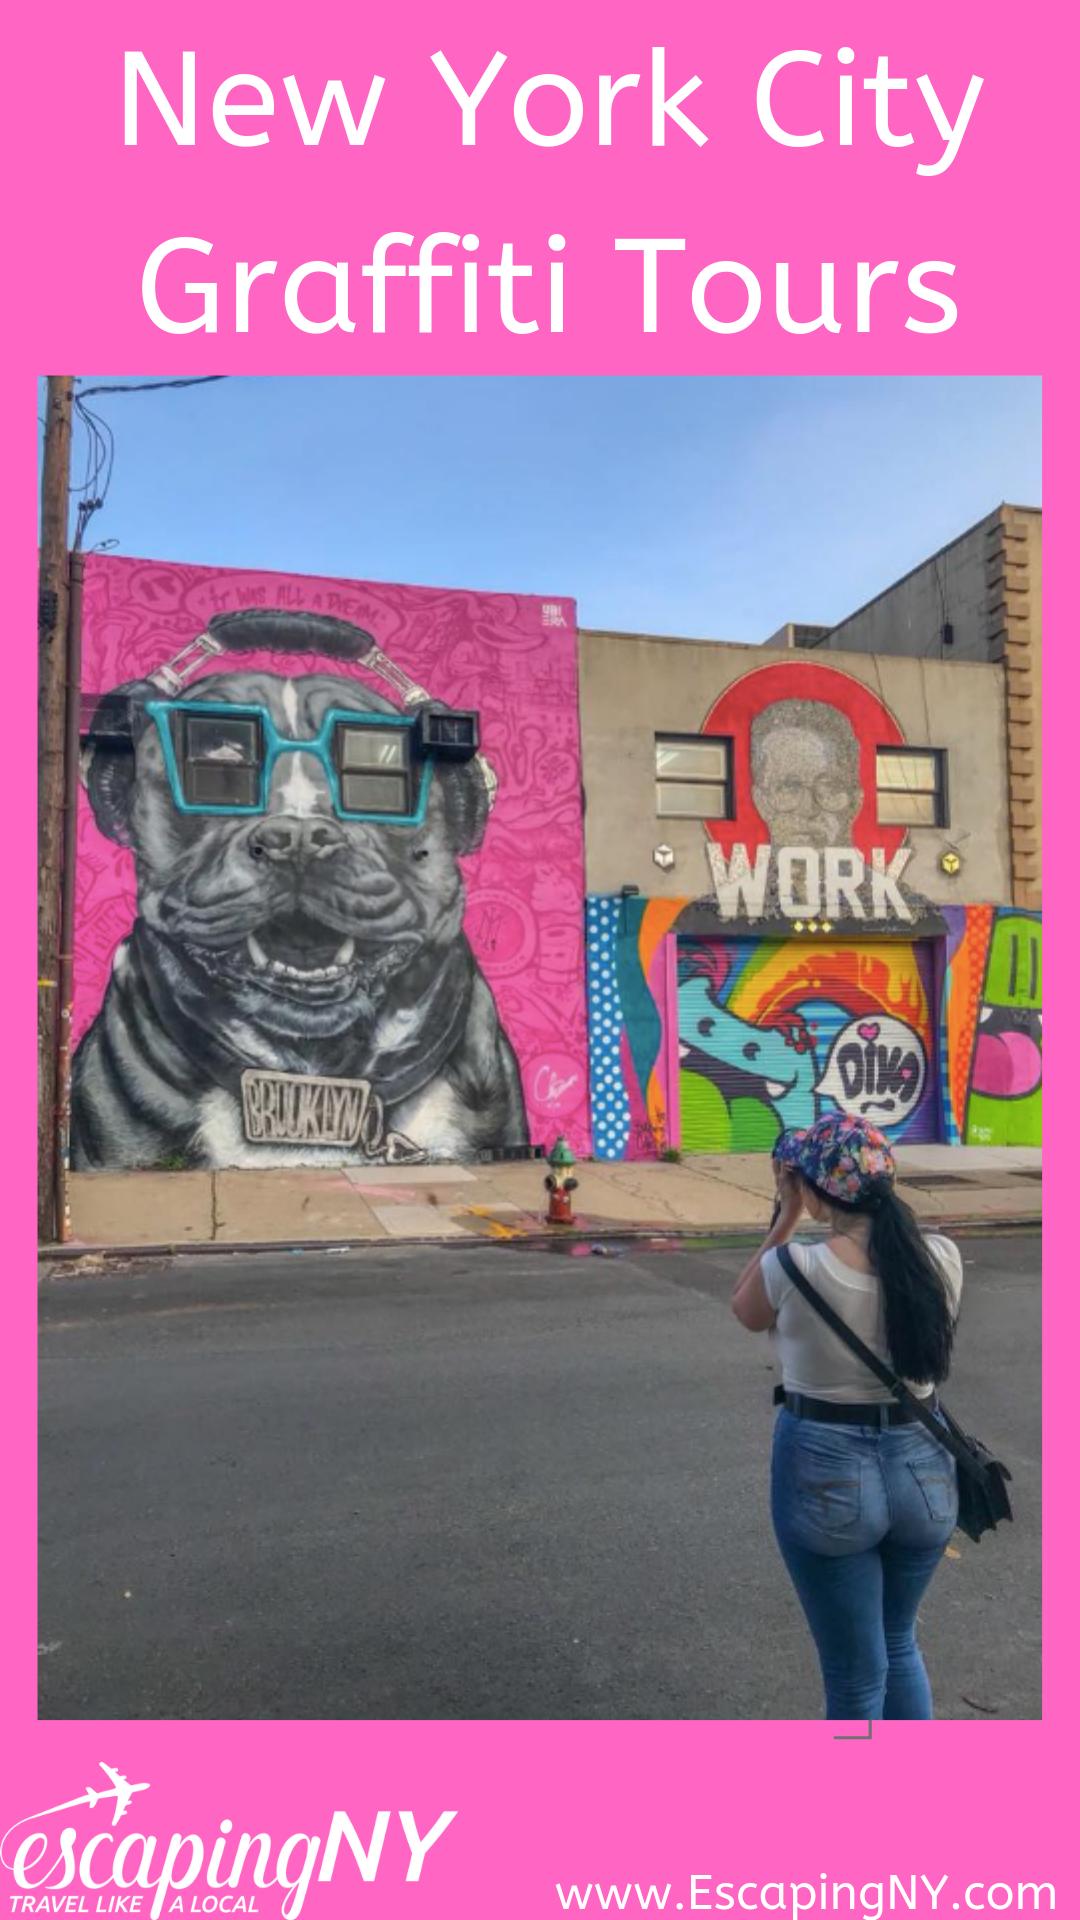 New_York_City_Graffiti_Tours.png